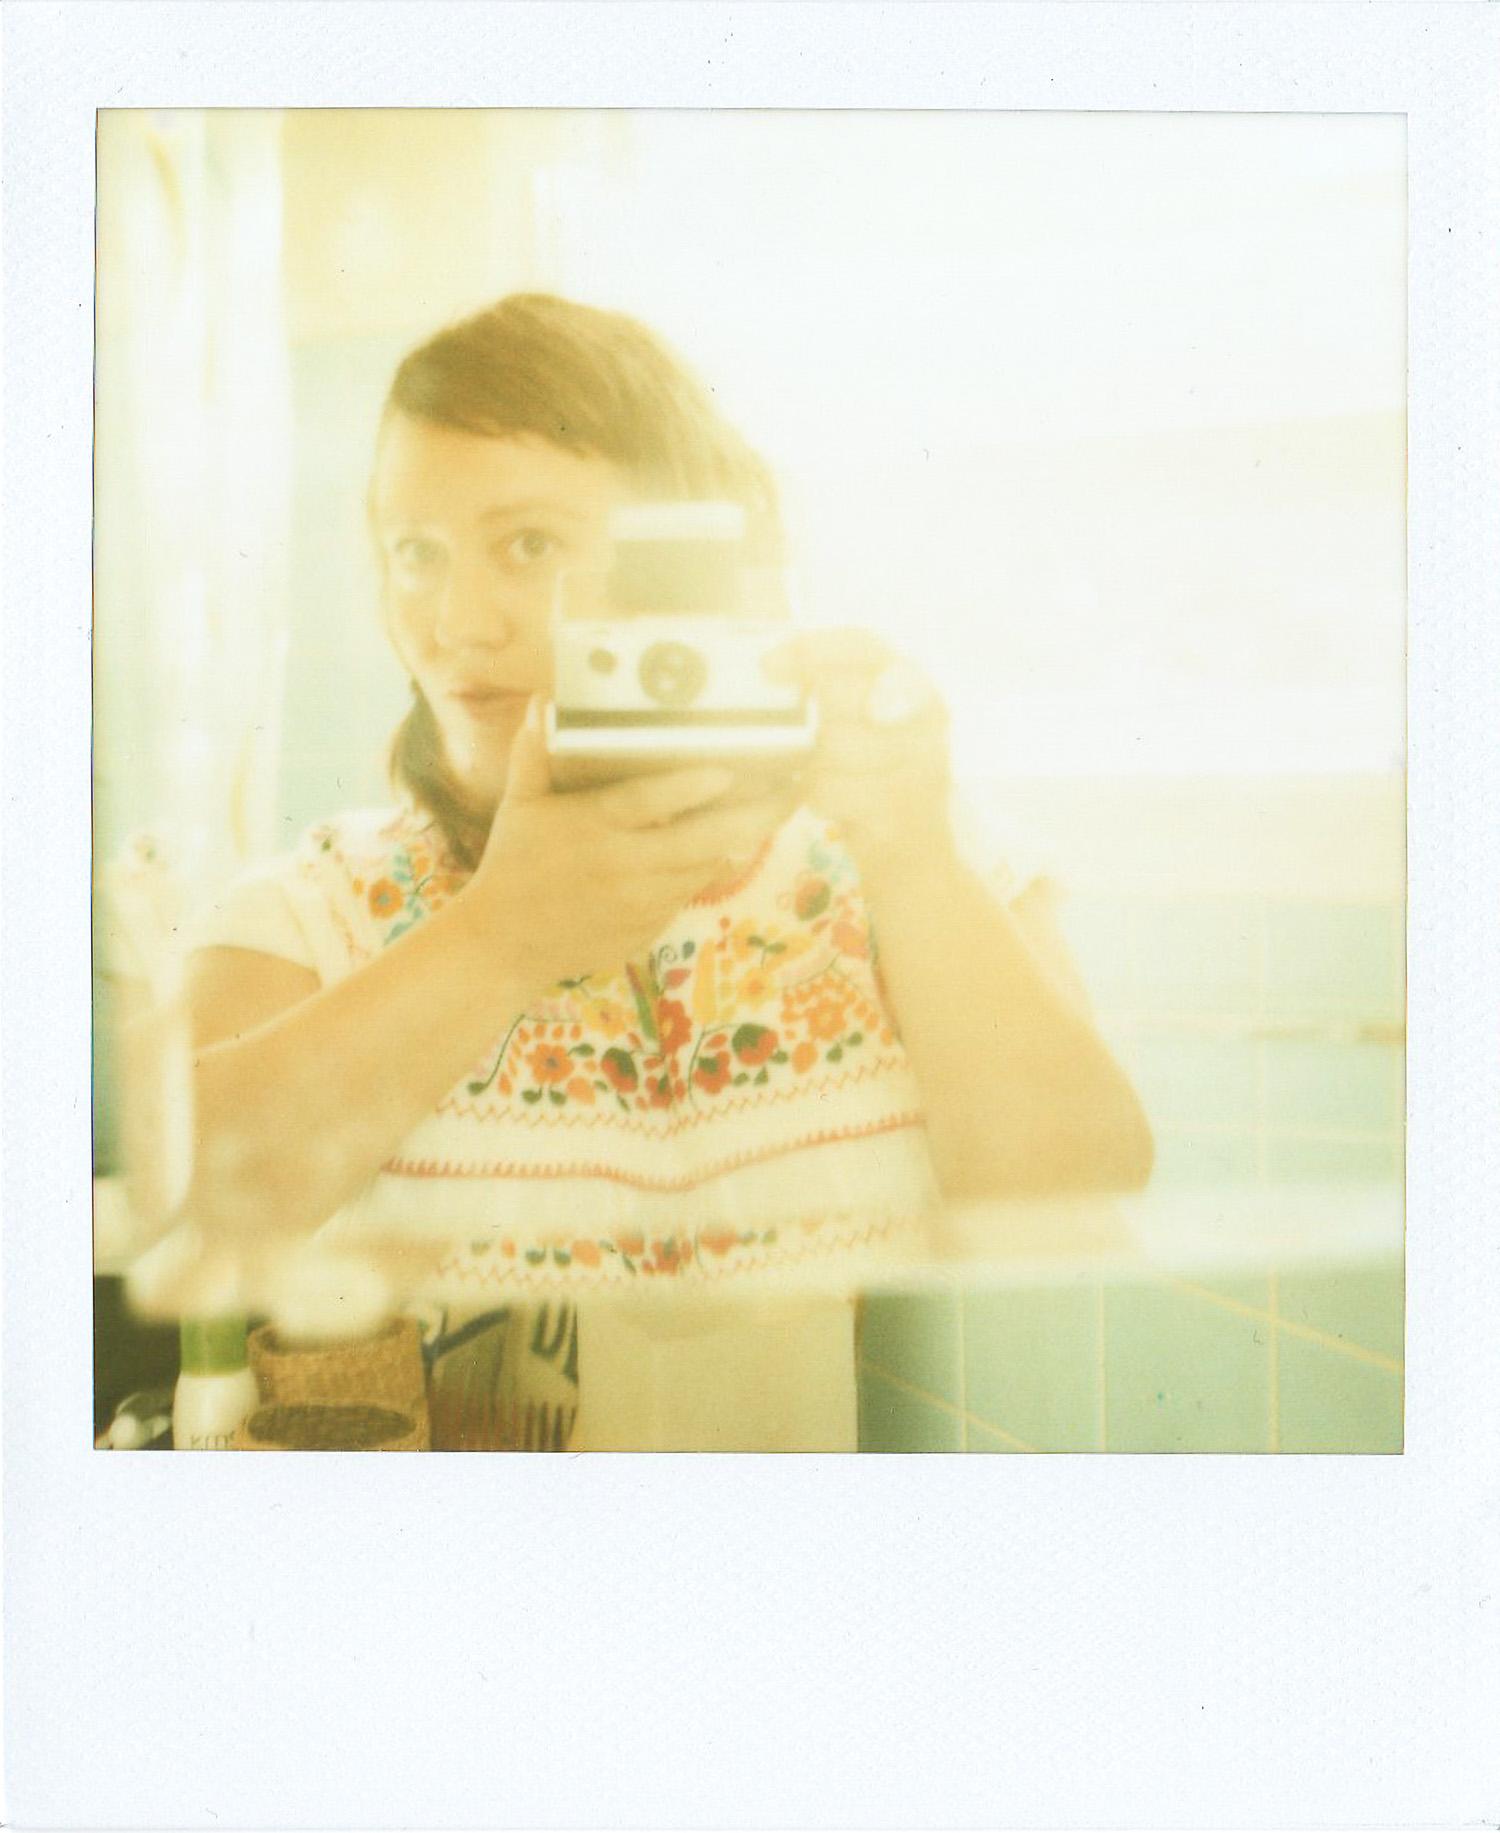 Andrea-Jenkins-self-portrait-Atlanta-Amsterdam-Polaroid-Impossible-Project-1.jpg